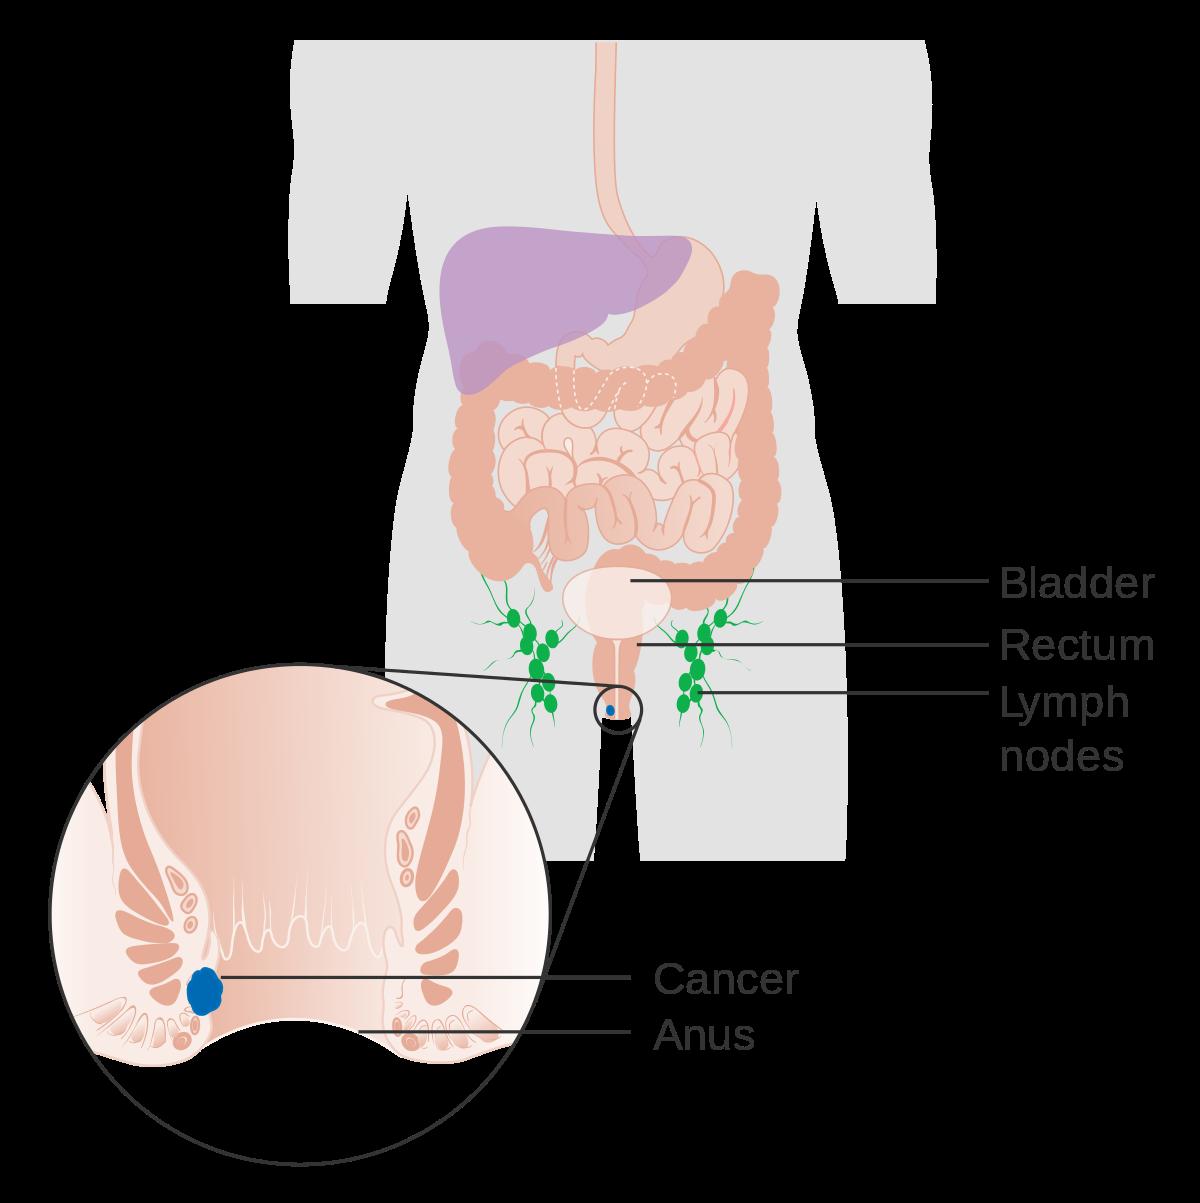 tumore ano da hpv cancer dereglement hormonal